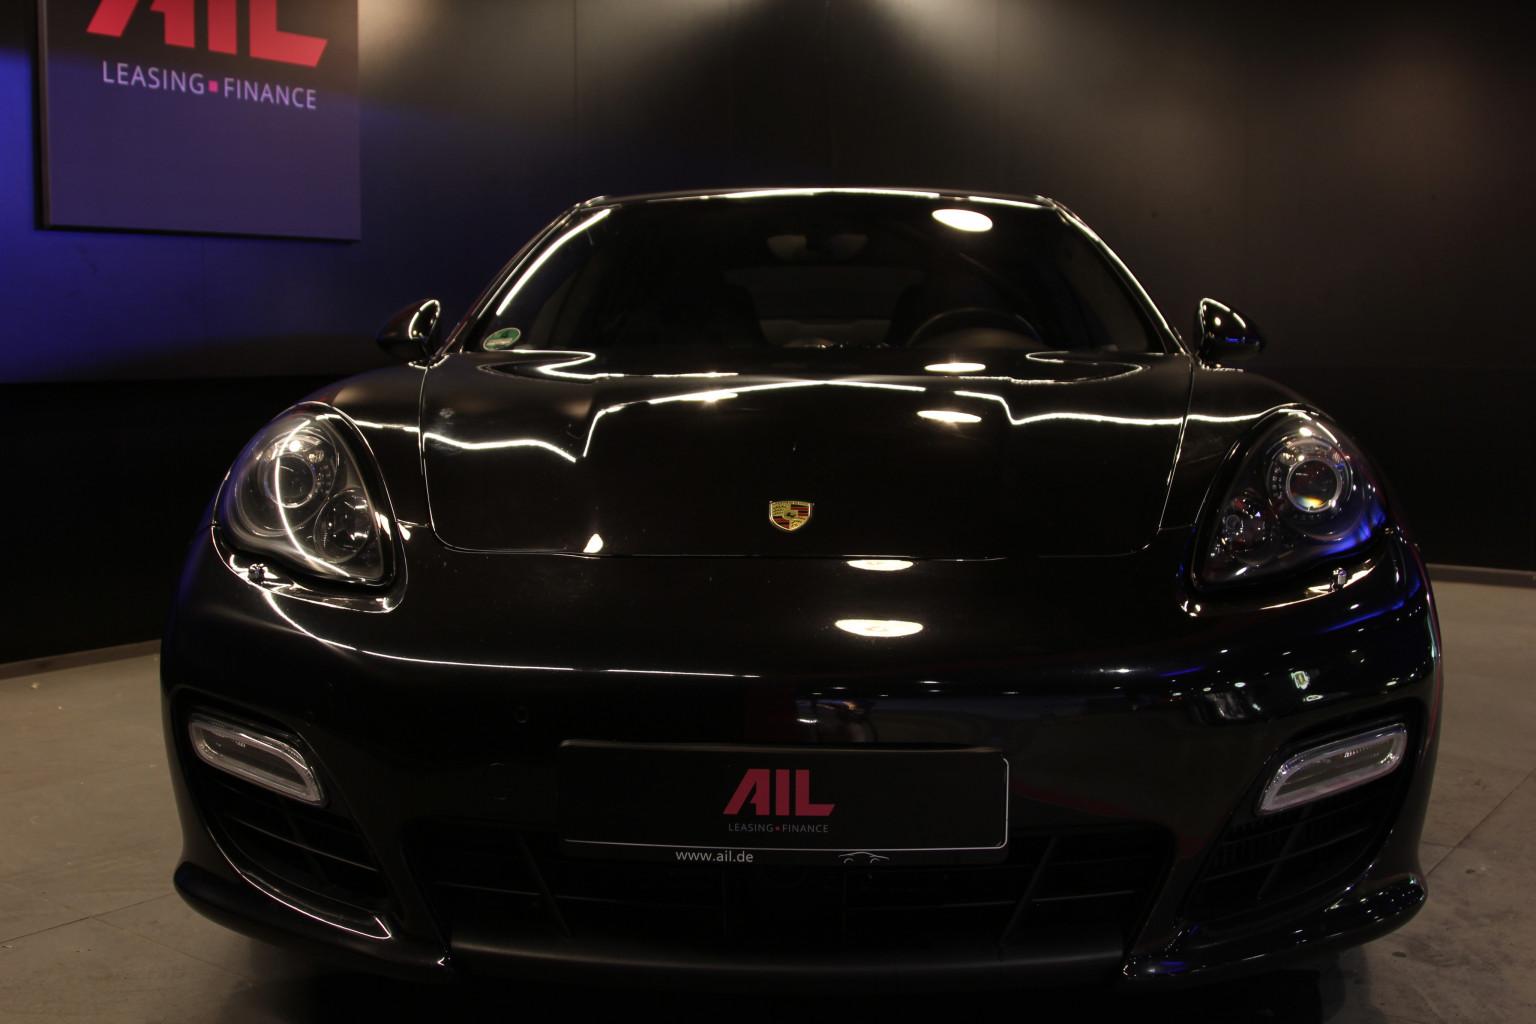 AIL Porsche Panamera Turbo S  Sport-Chrono-Paket  1